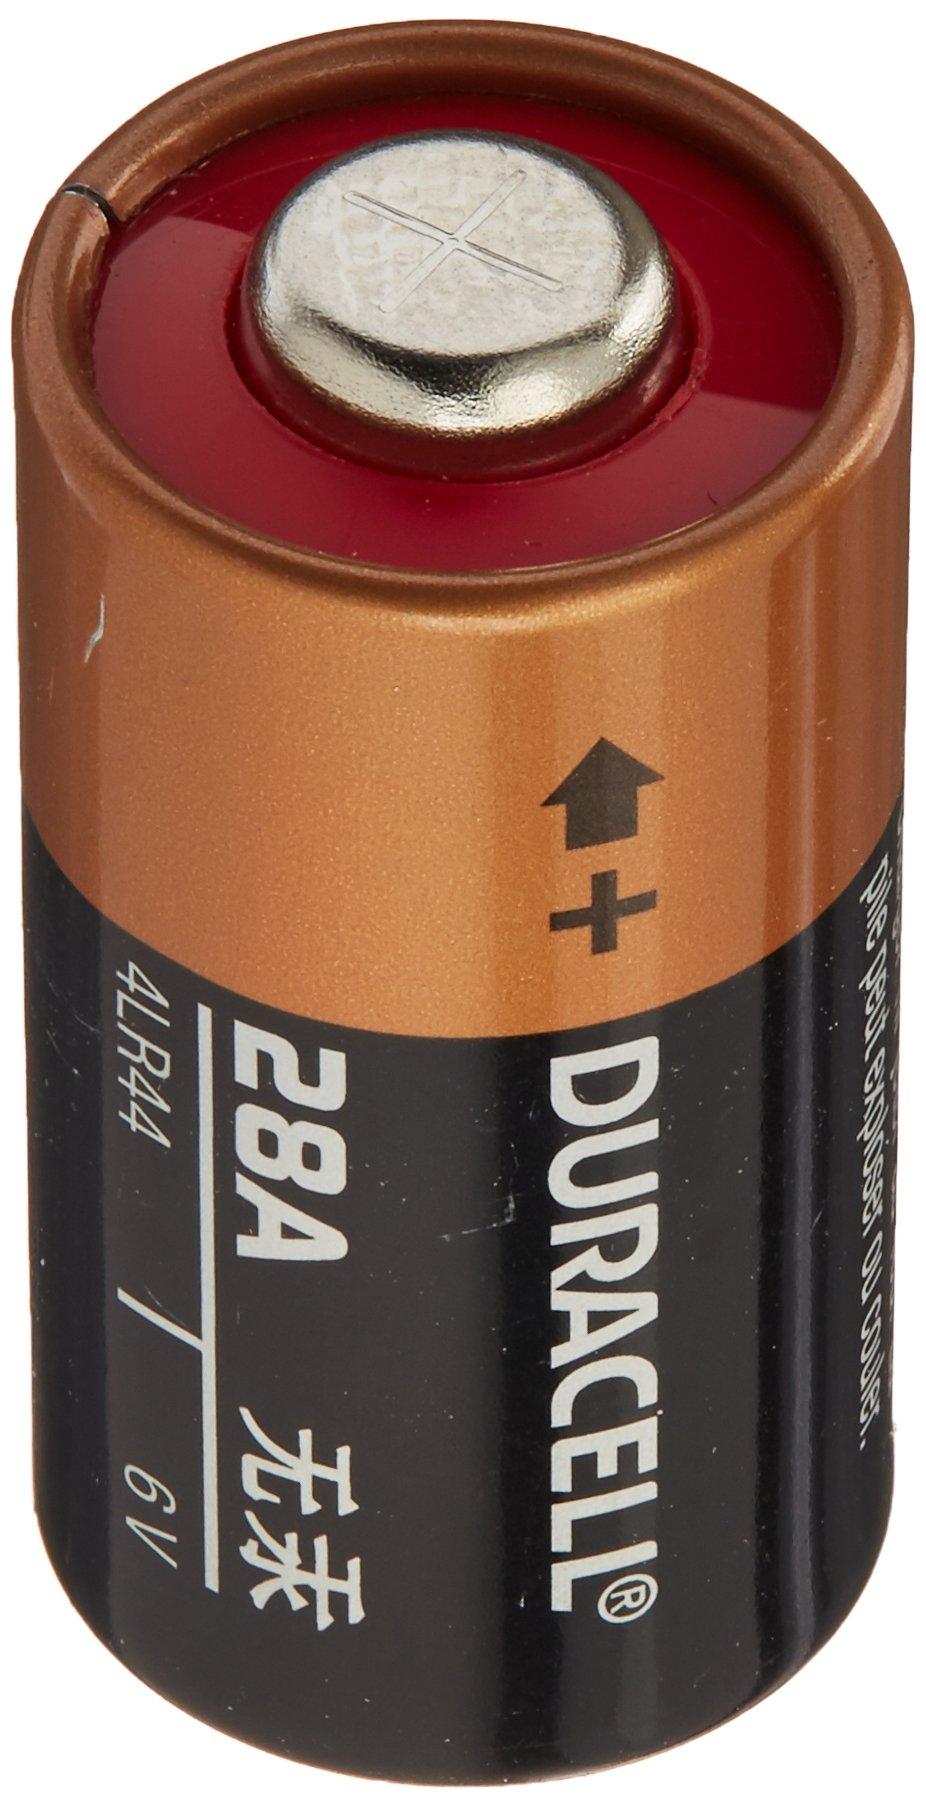 Duracell Medical 28A Alkaline Battery 6V, 4 Count